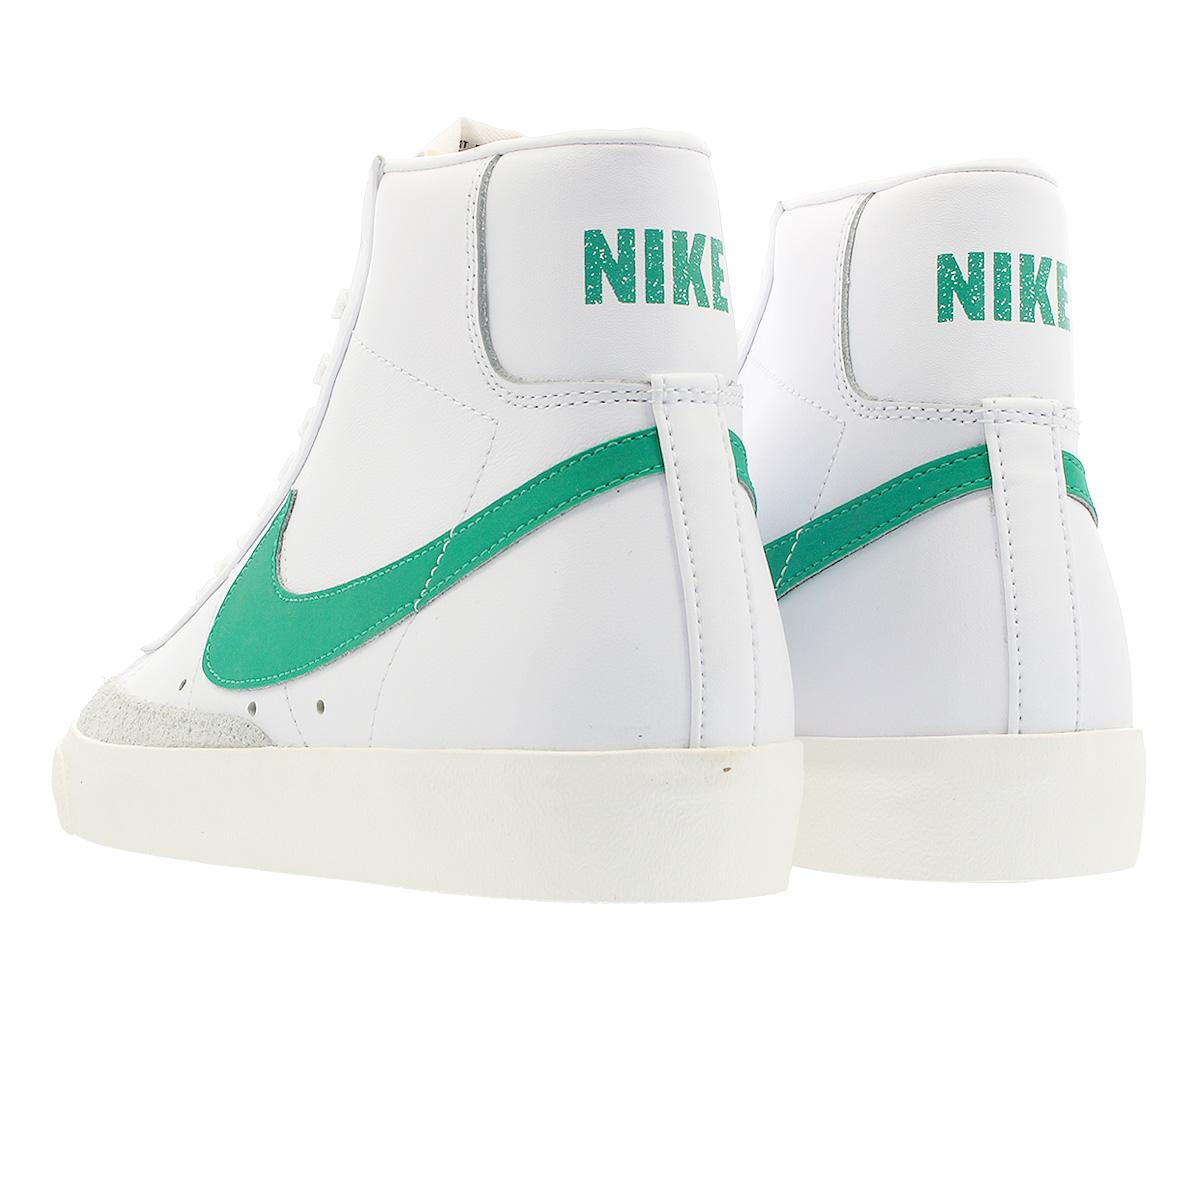 f1ddd87d065f NIKE BLAZER MID  77 VINTAGE Nike blazer mid  77 vintage LUCID GREEN WHITE SAIL  bq6806-300